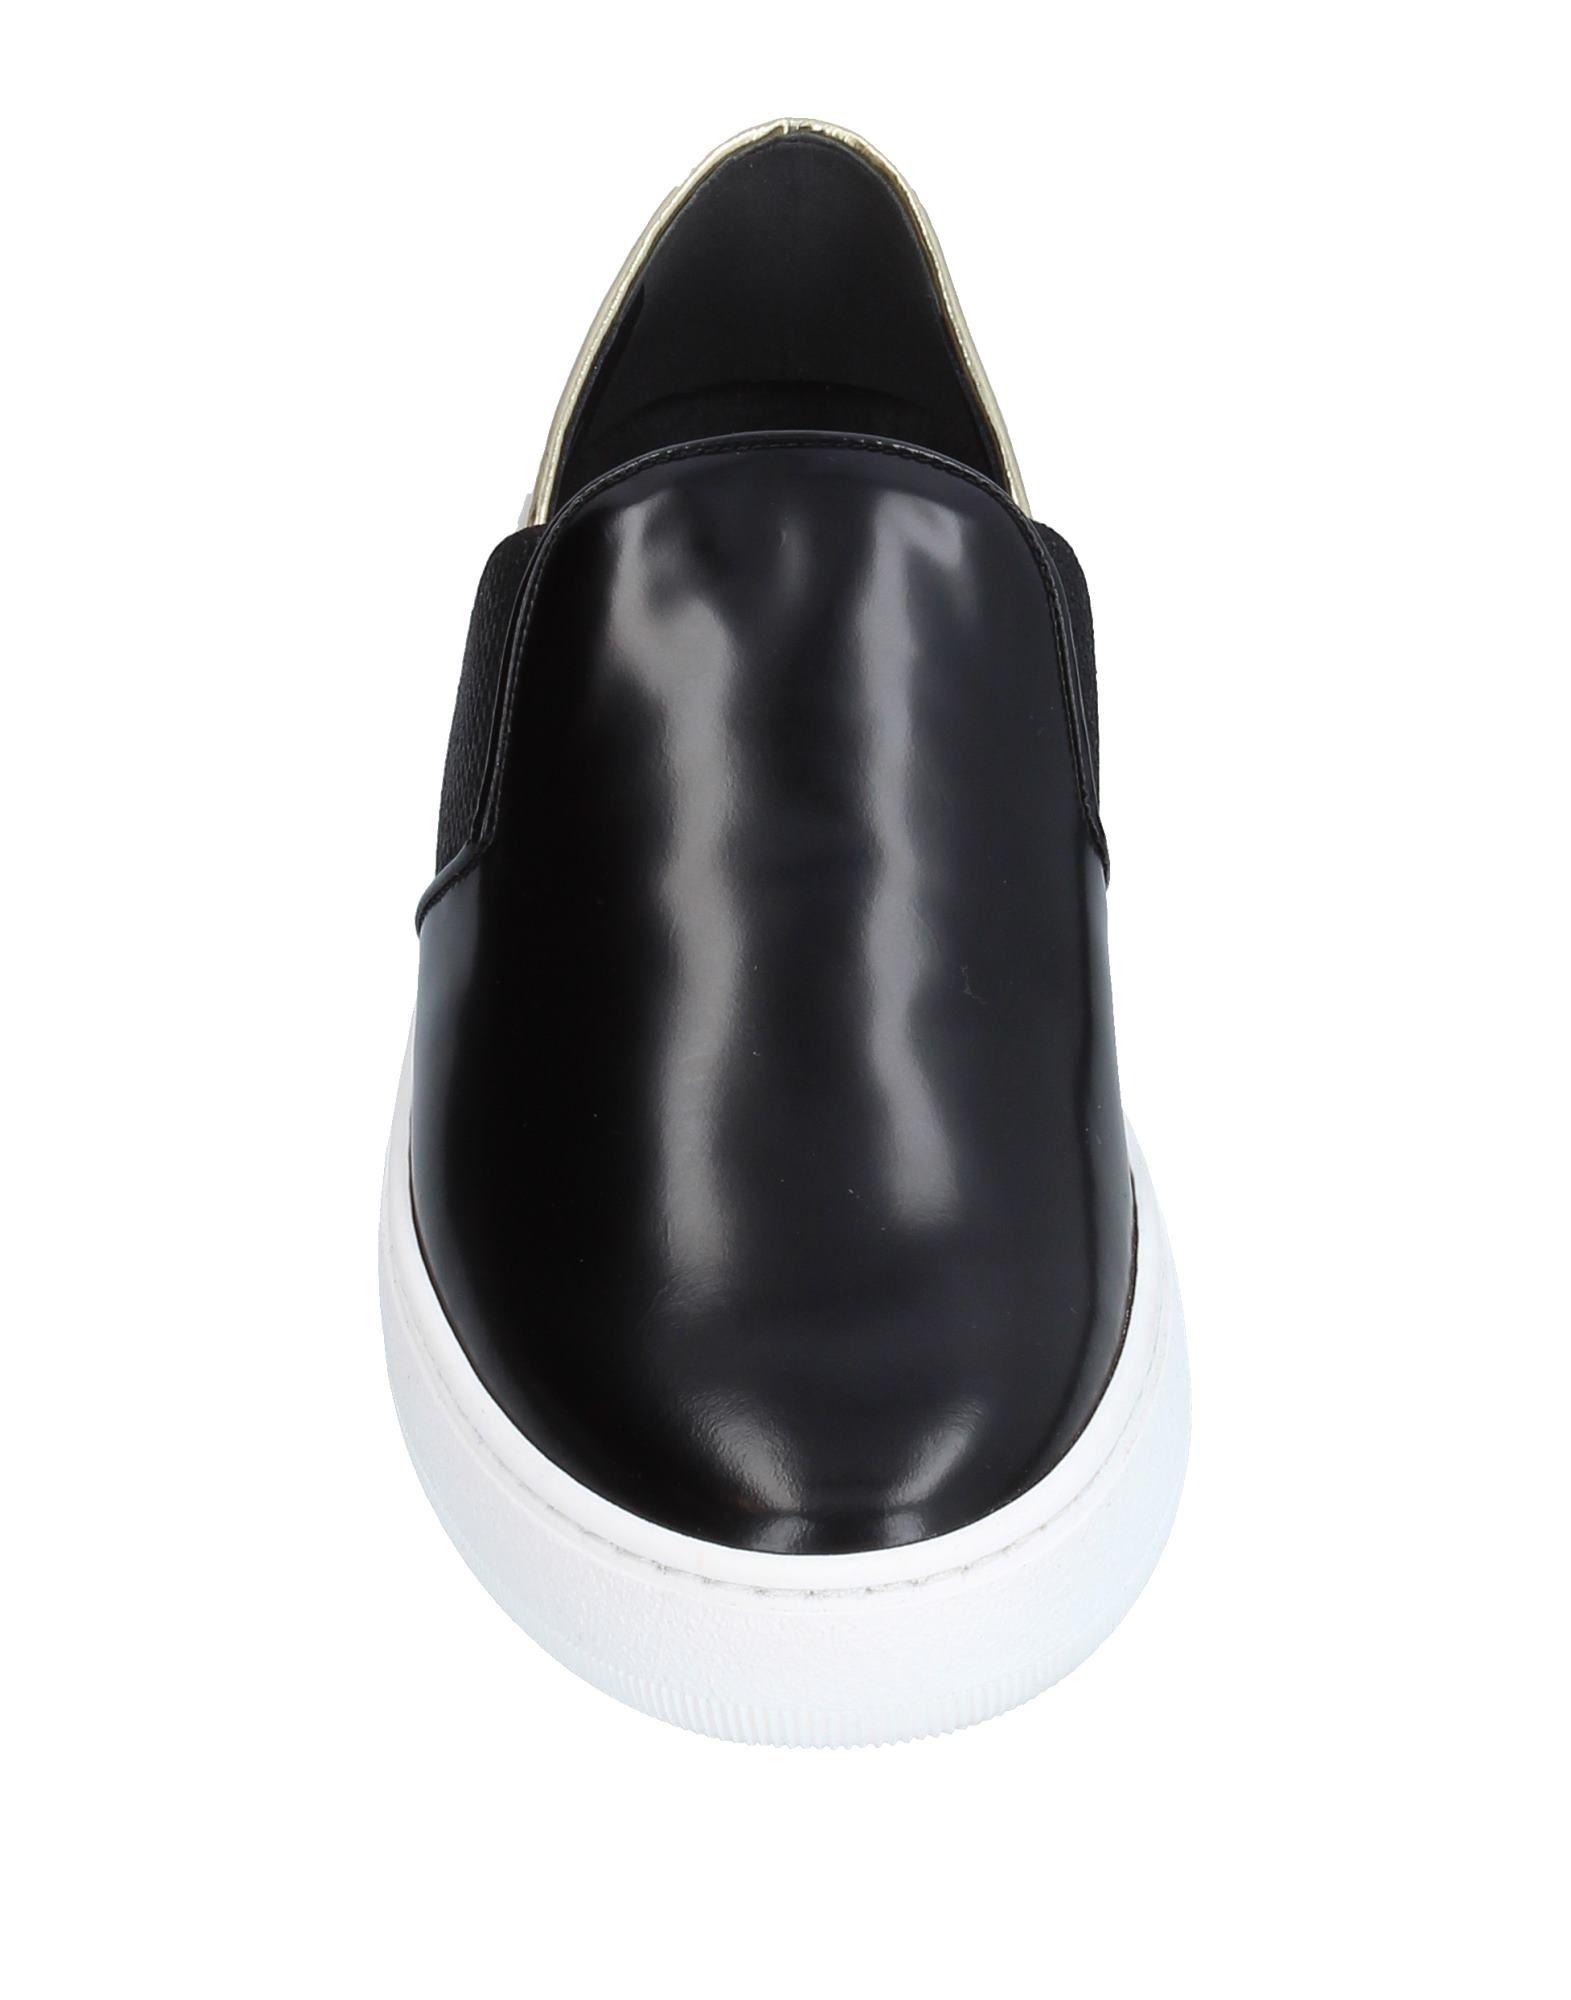 Philippe Model Sneakers - Women Philippe  Model Sneakers online on  Philippe Canada - 11341558UJ 1f9653